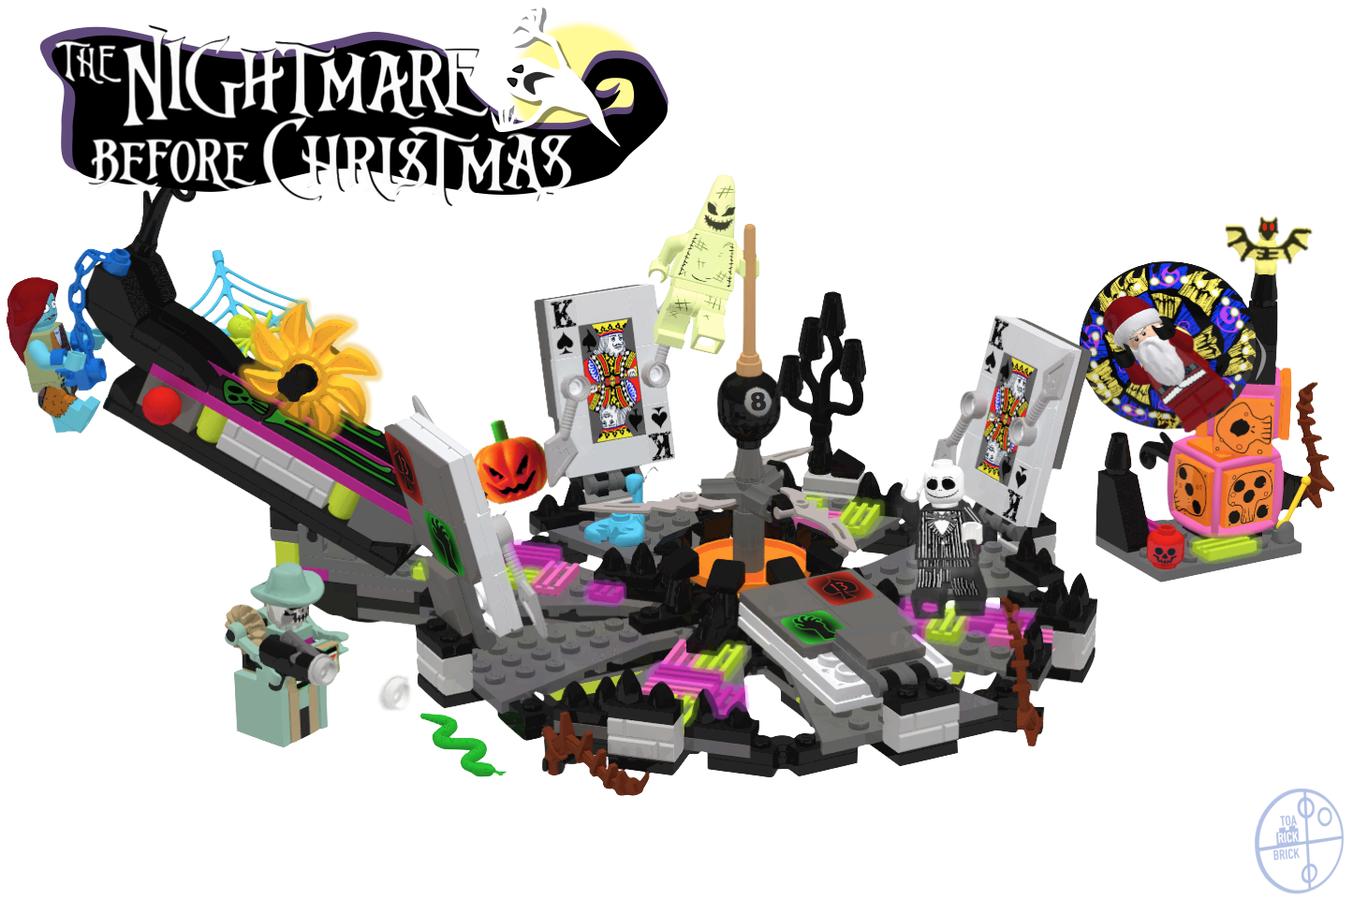 LEGO IDEAS - Product Ideas - Nightmare Before Christmas